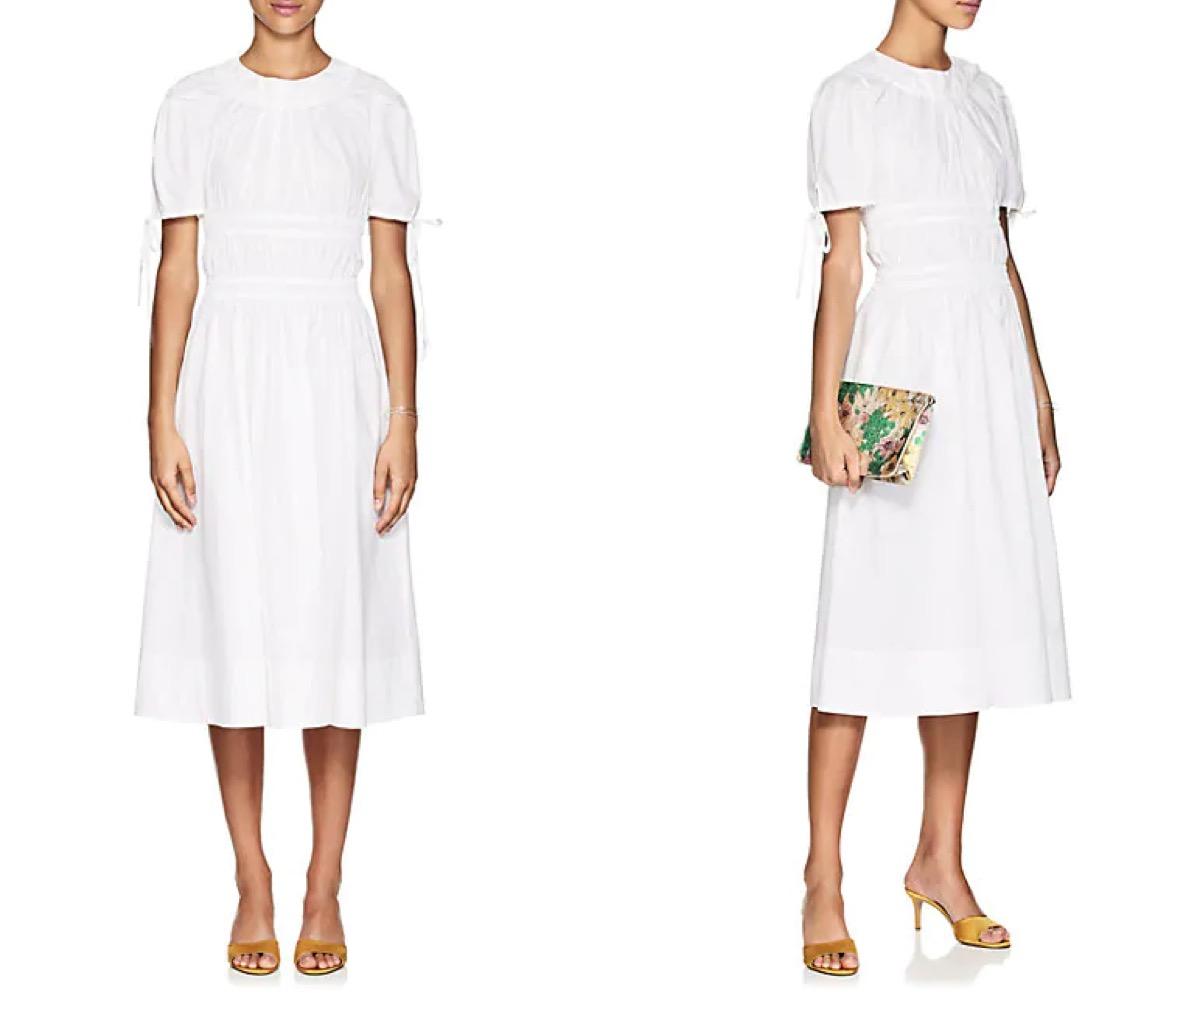 Brock Poplin White Dress buy after holidays